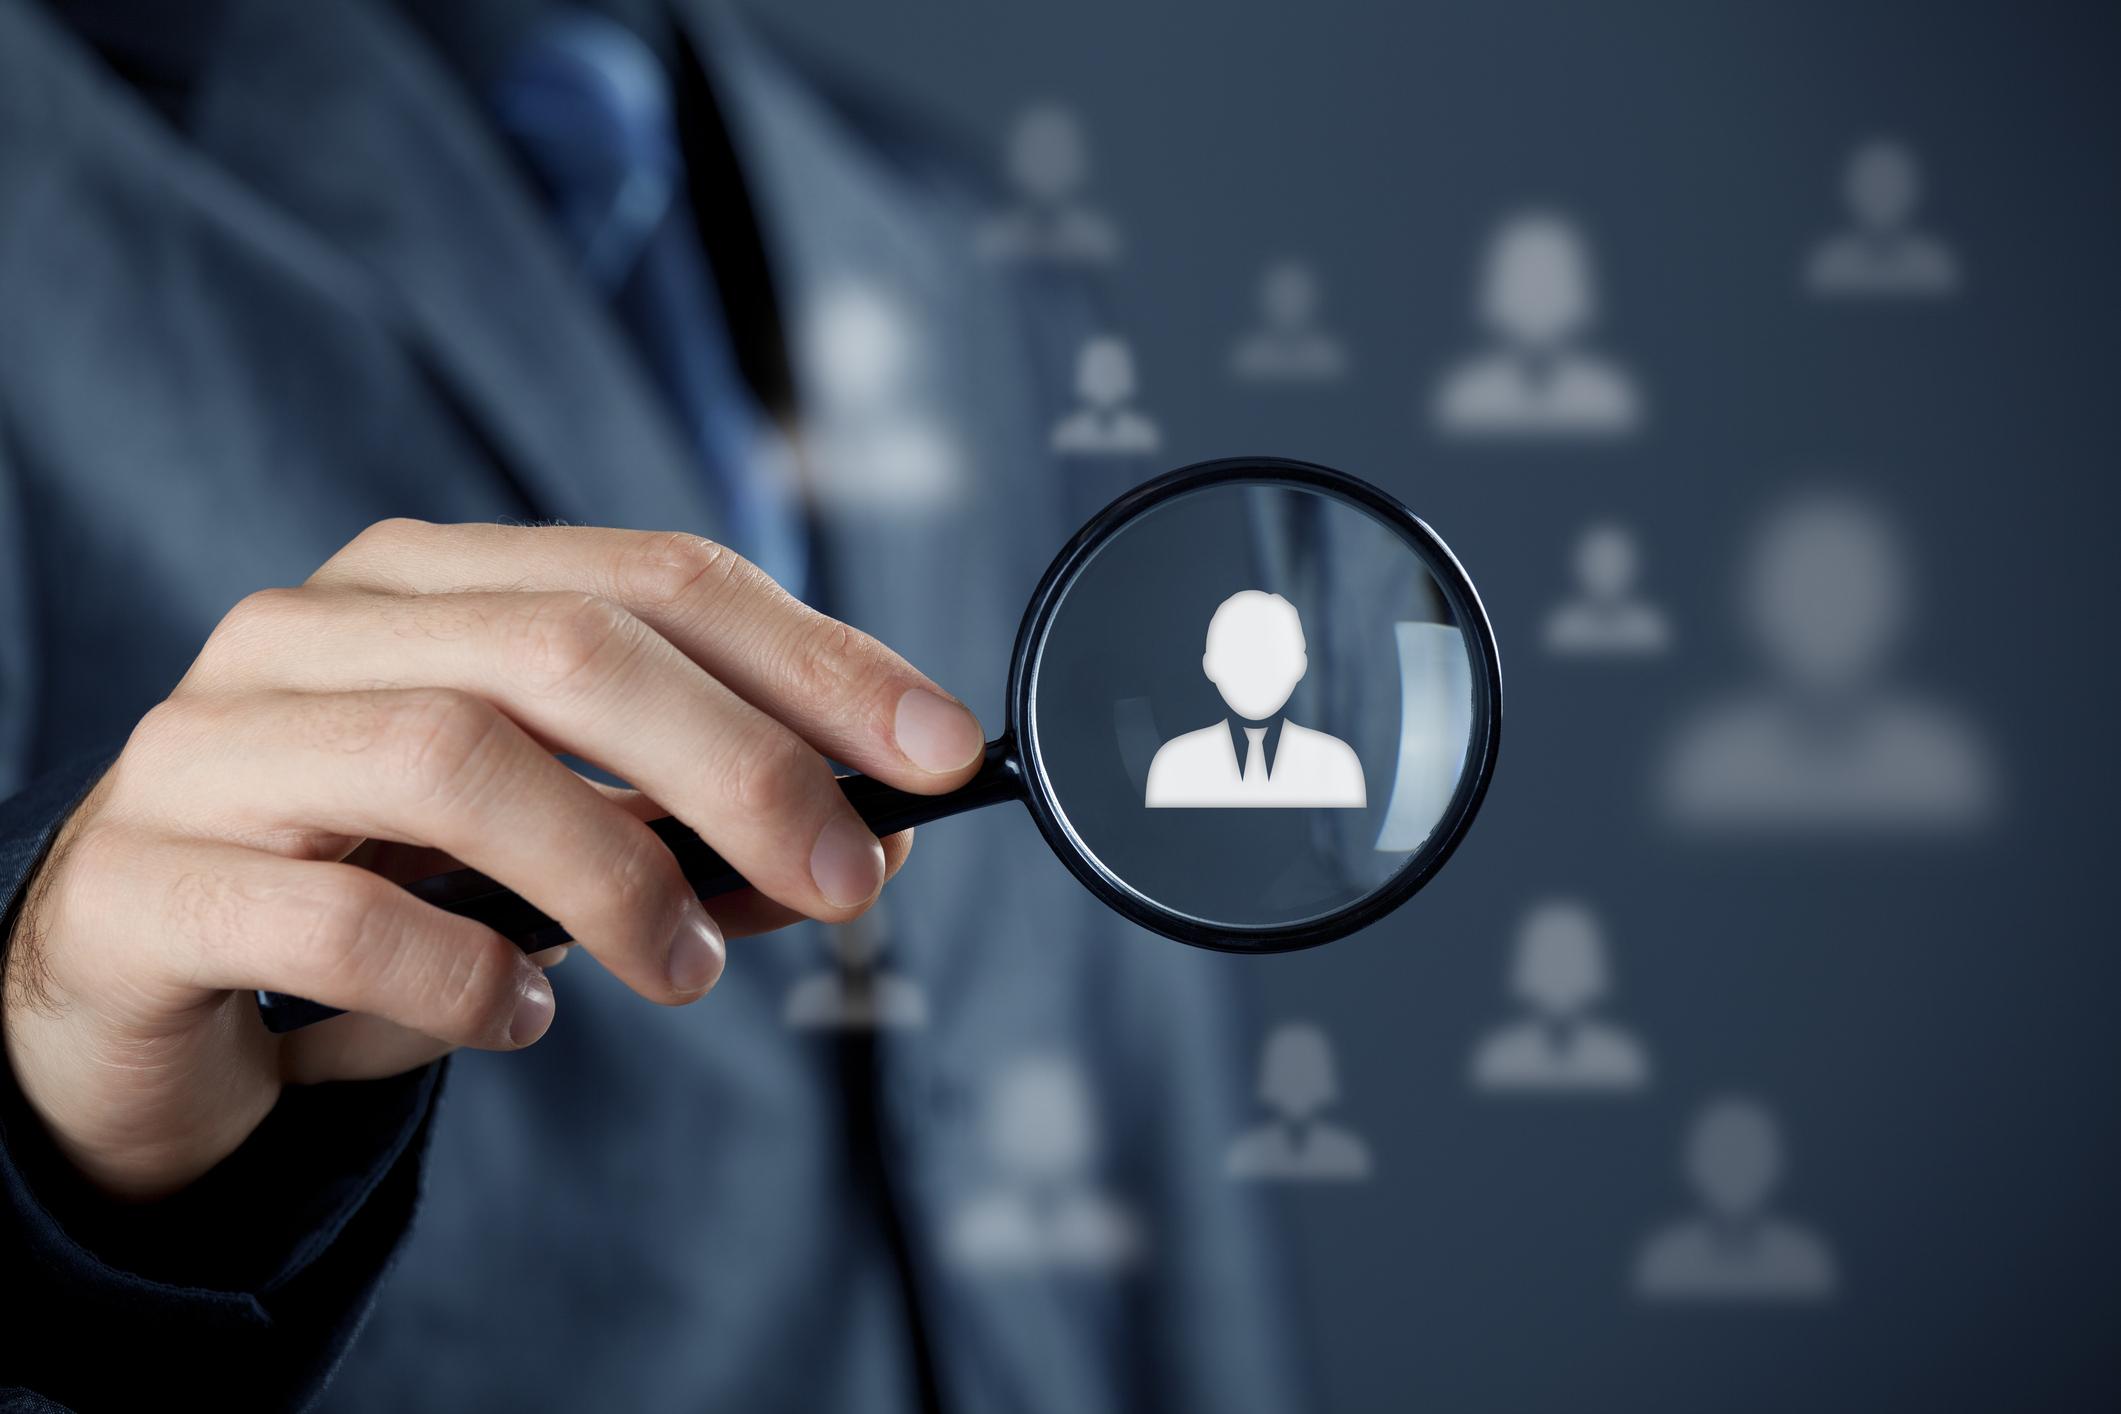 Microsoft Dynamics 365 for Sales Customer Engagement